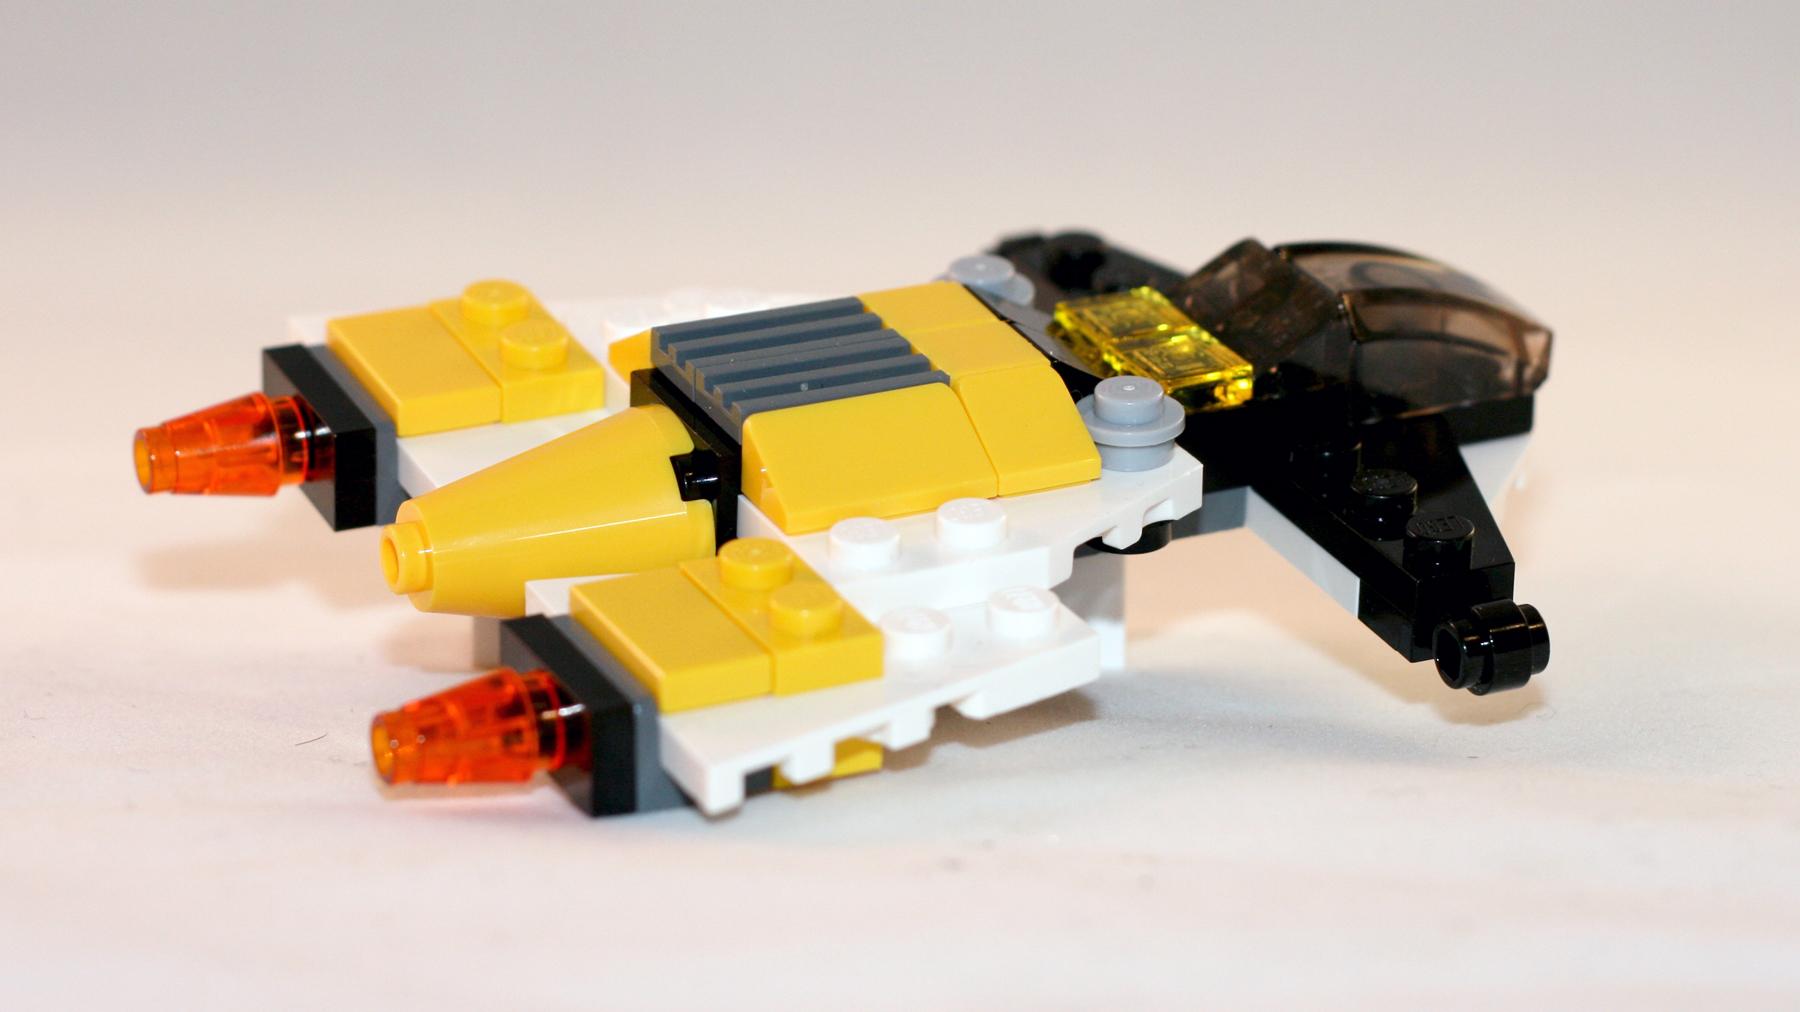 Lego 31001 Alternate Moc Galactic Cruiser Huckleberry Brick The Lord Of Rings Battle At Black Gate 79007 Galatctic